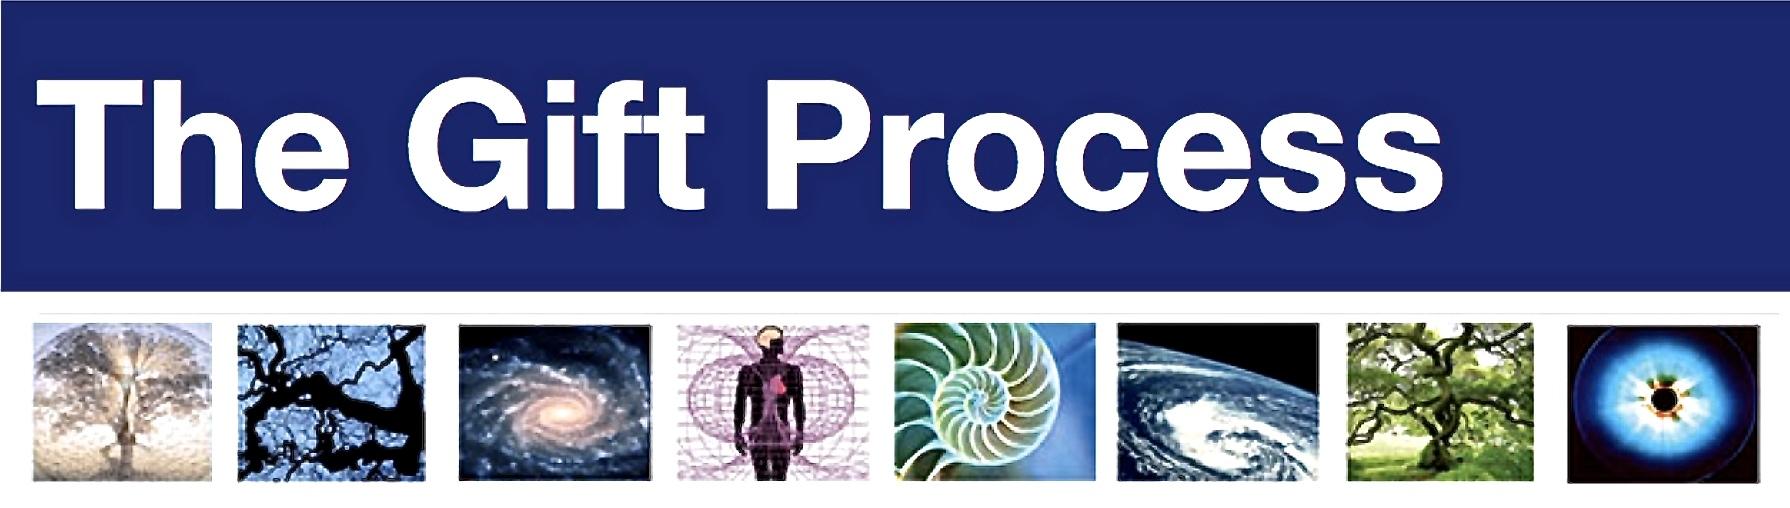 Gift Process